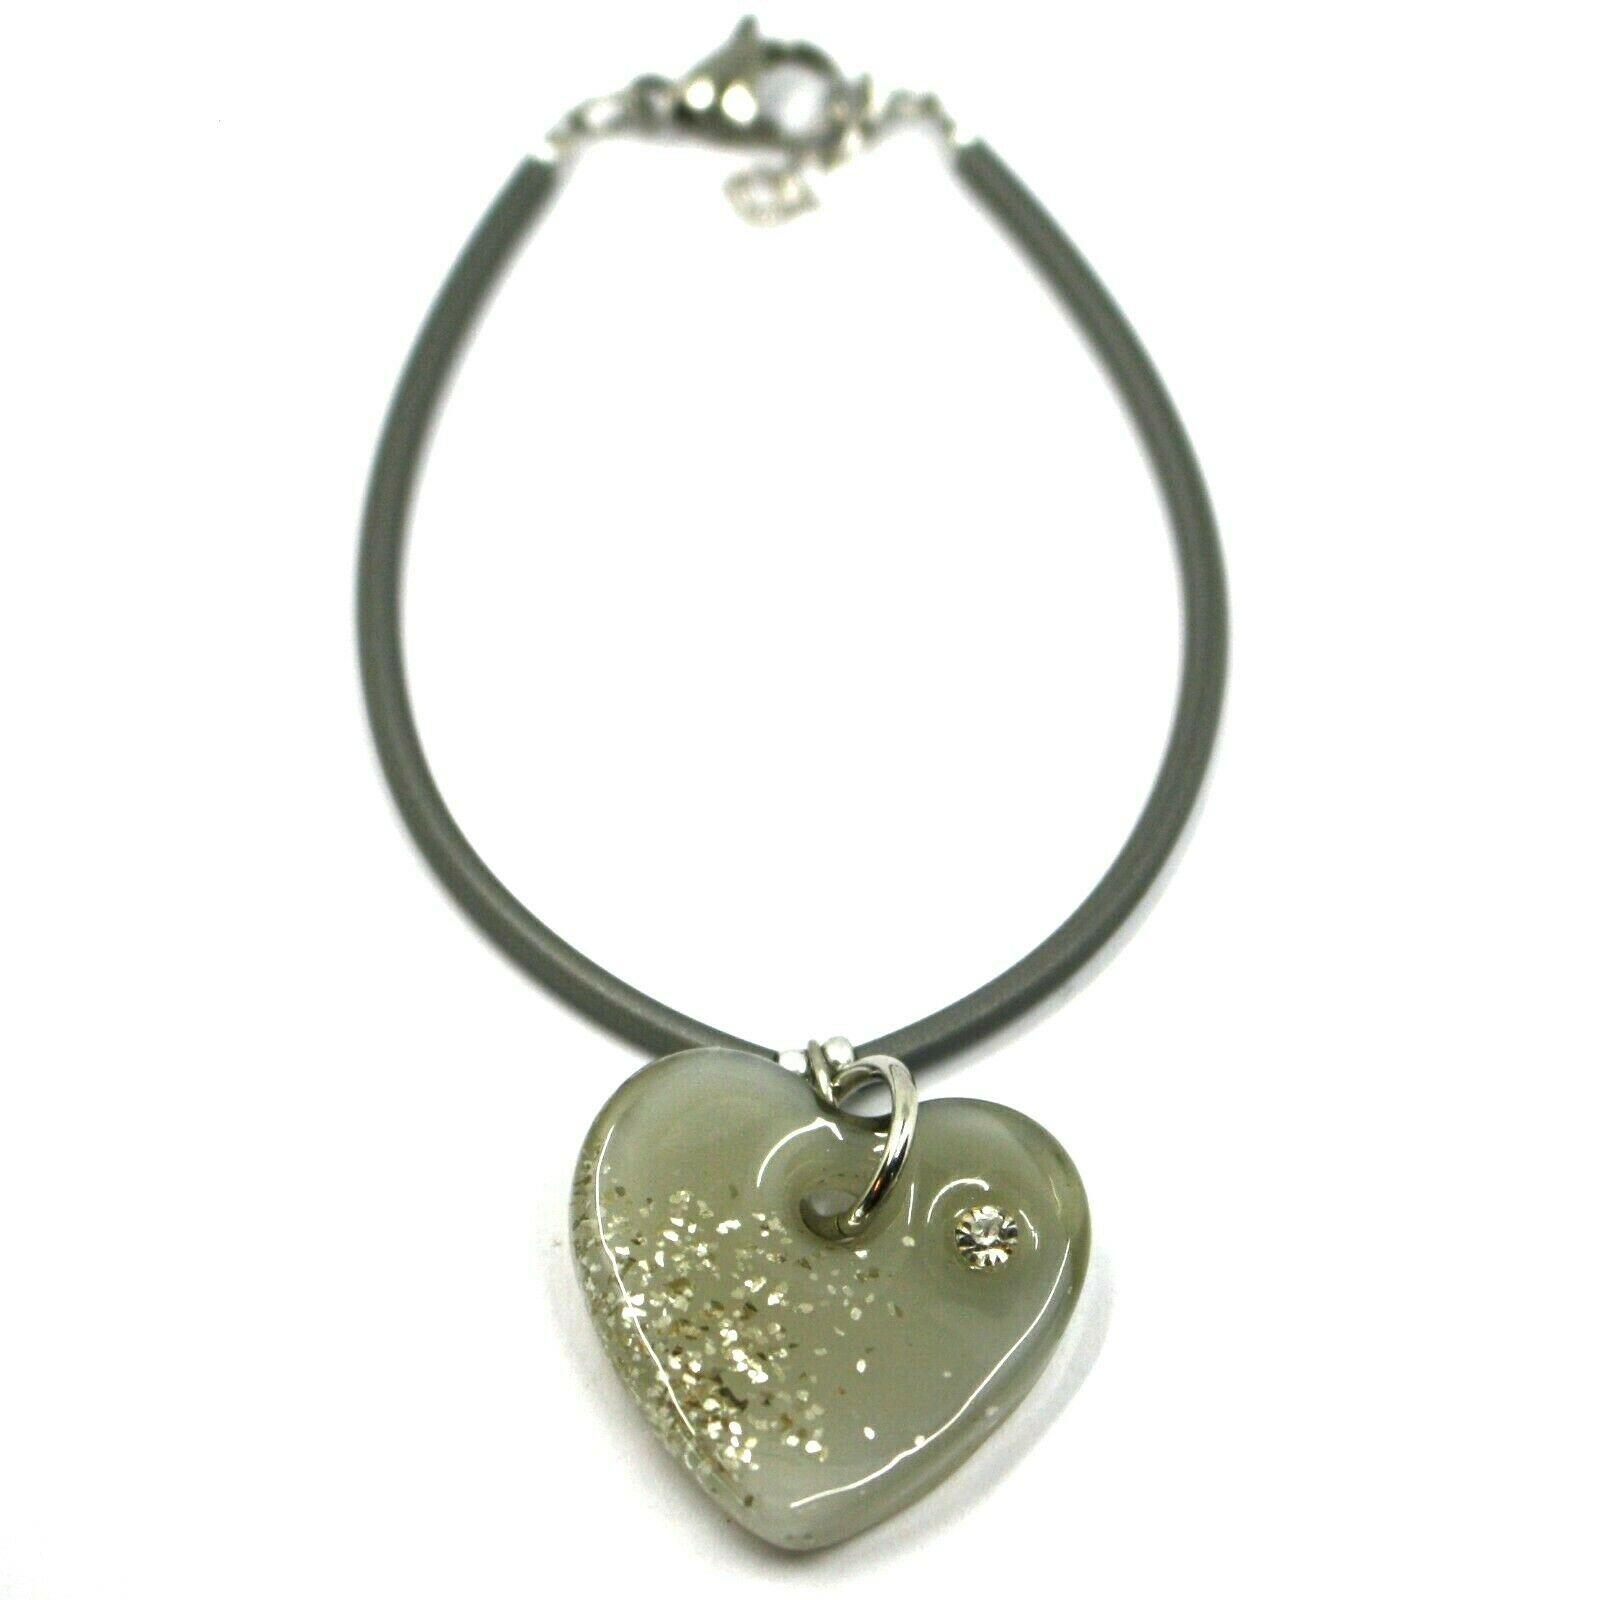 Bracelet Rubber and Steel Antica Murrina Venezia, BR096M12, Heart Glass Gray